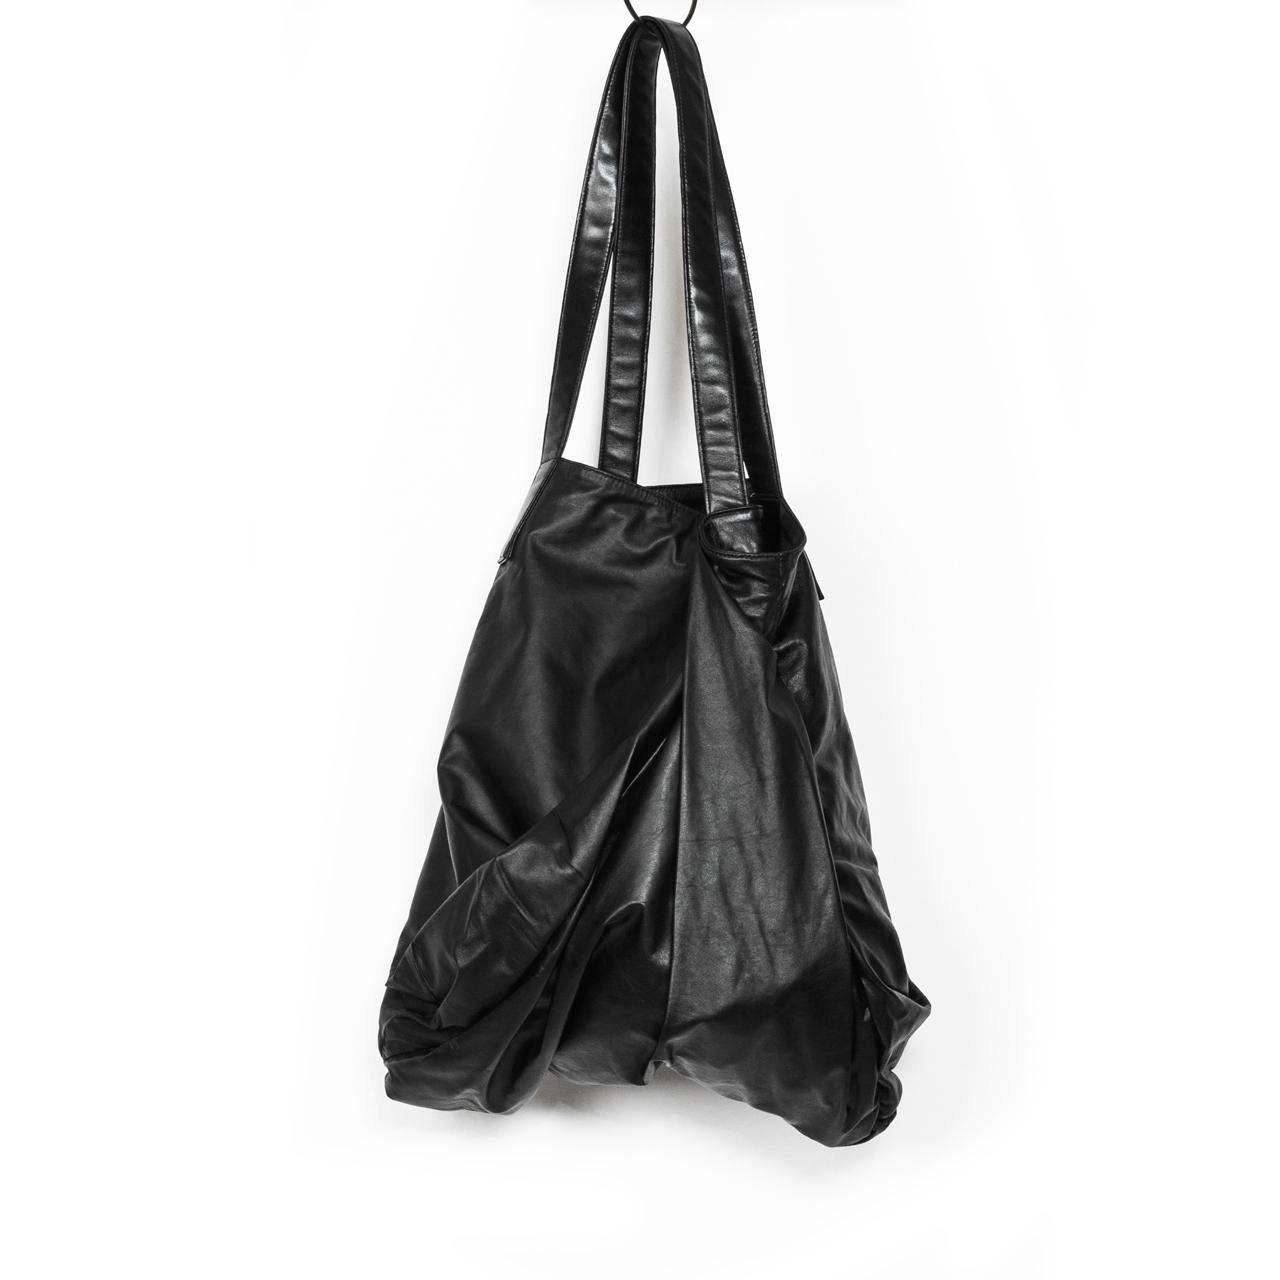 697BGU2-L-BLACK / レザートートバッグ